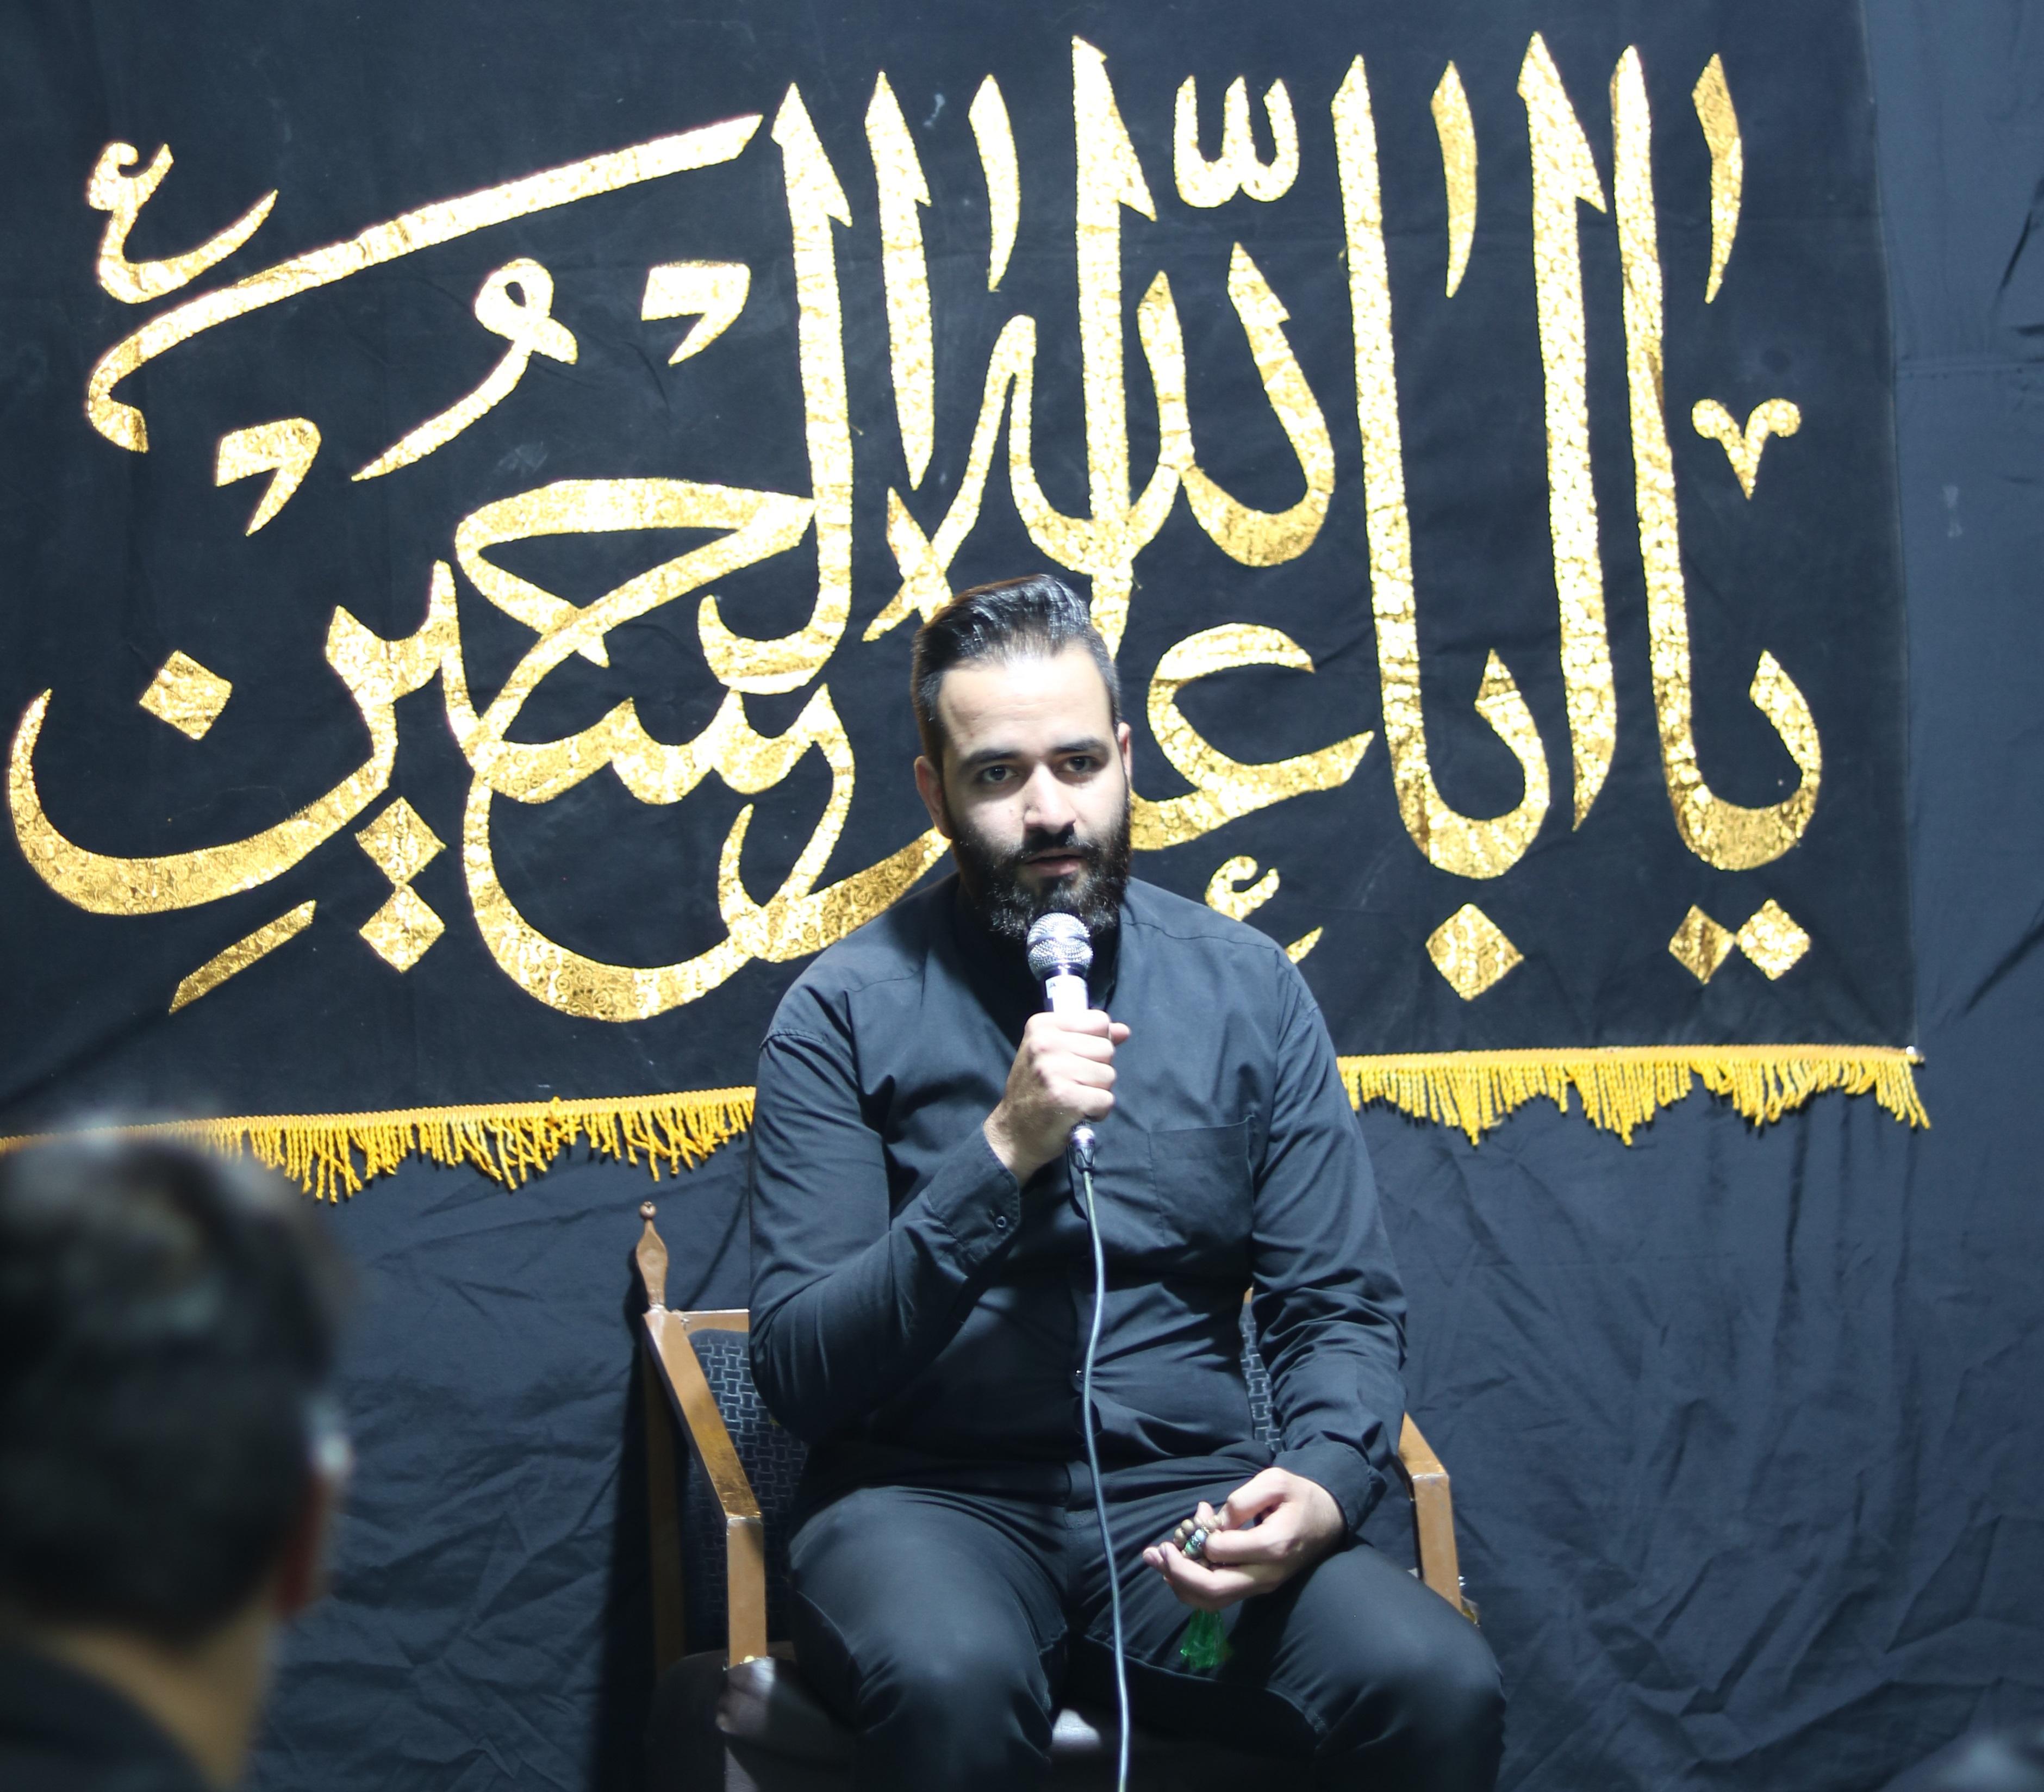 دانلود عکس و والپيپر HD | شهادت امام صادق(ع) 29 خرداد 1399